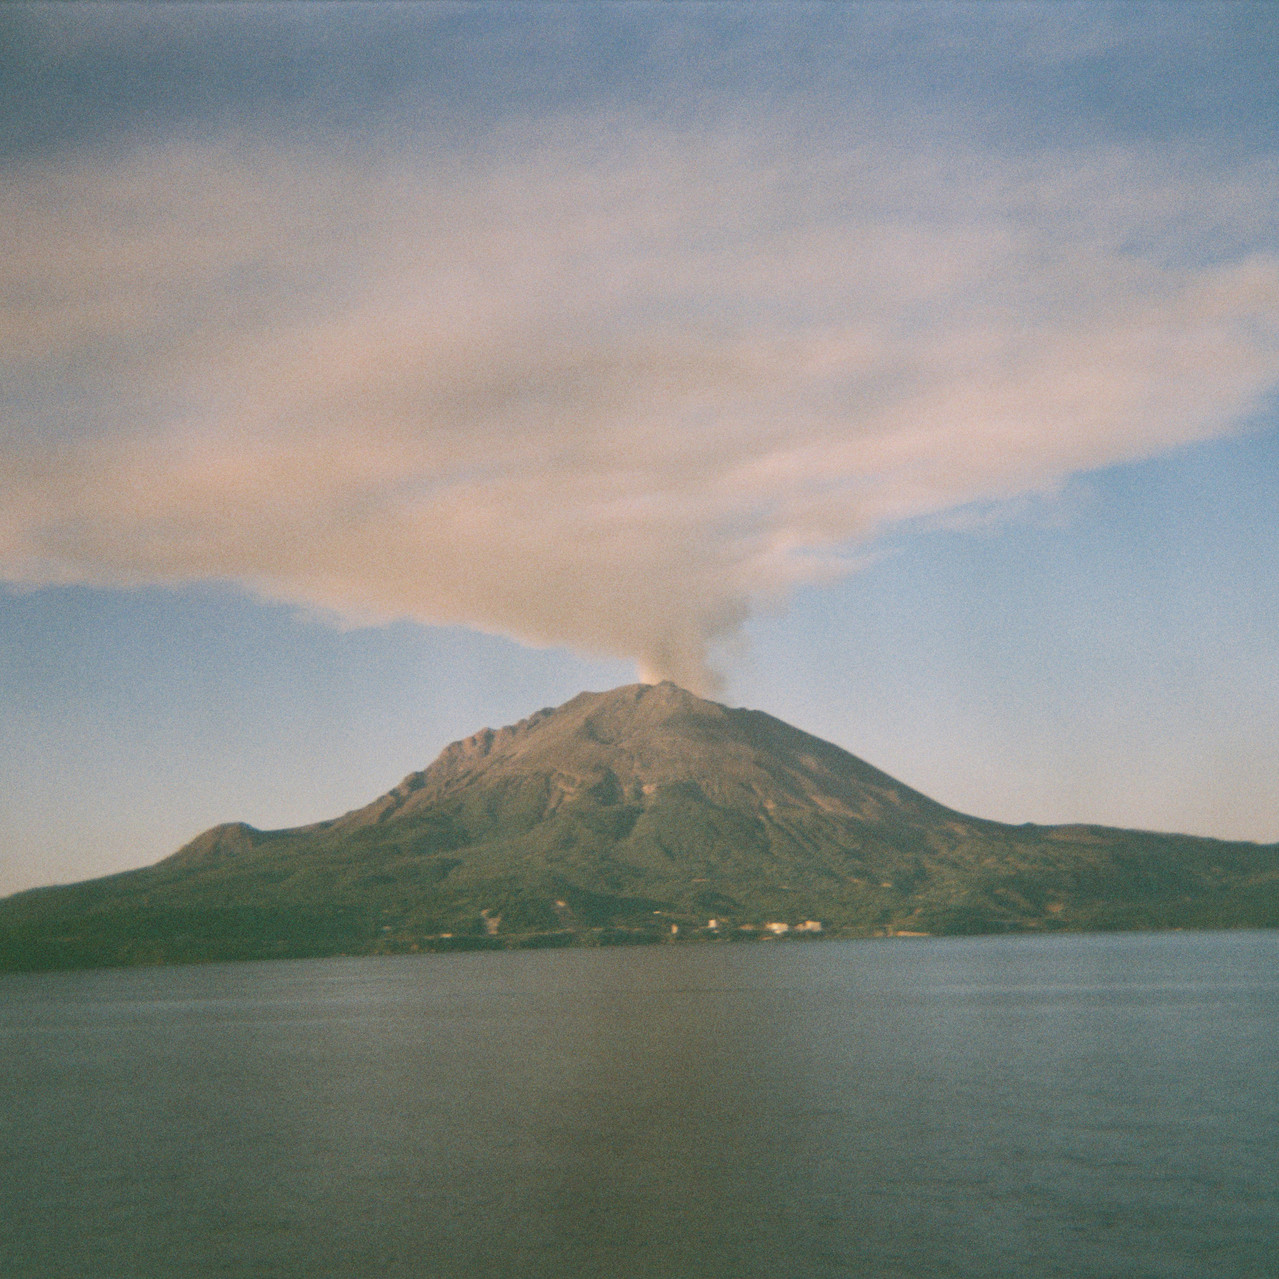 Sakurajima (October 31st, 2019) IV